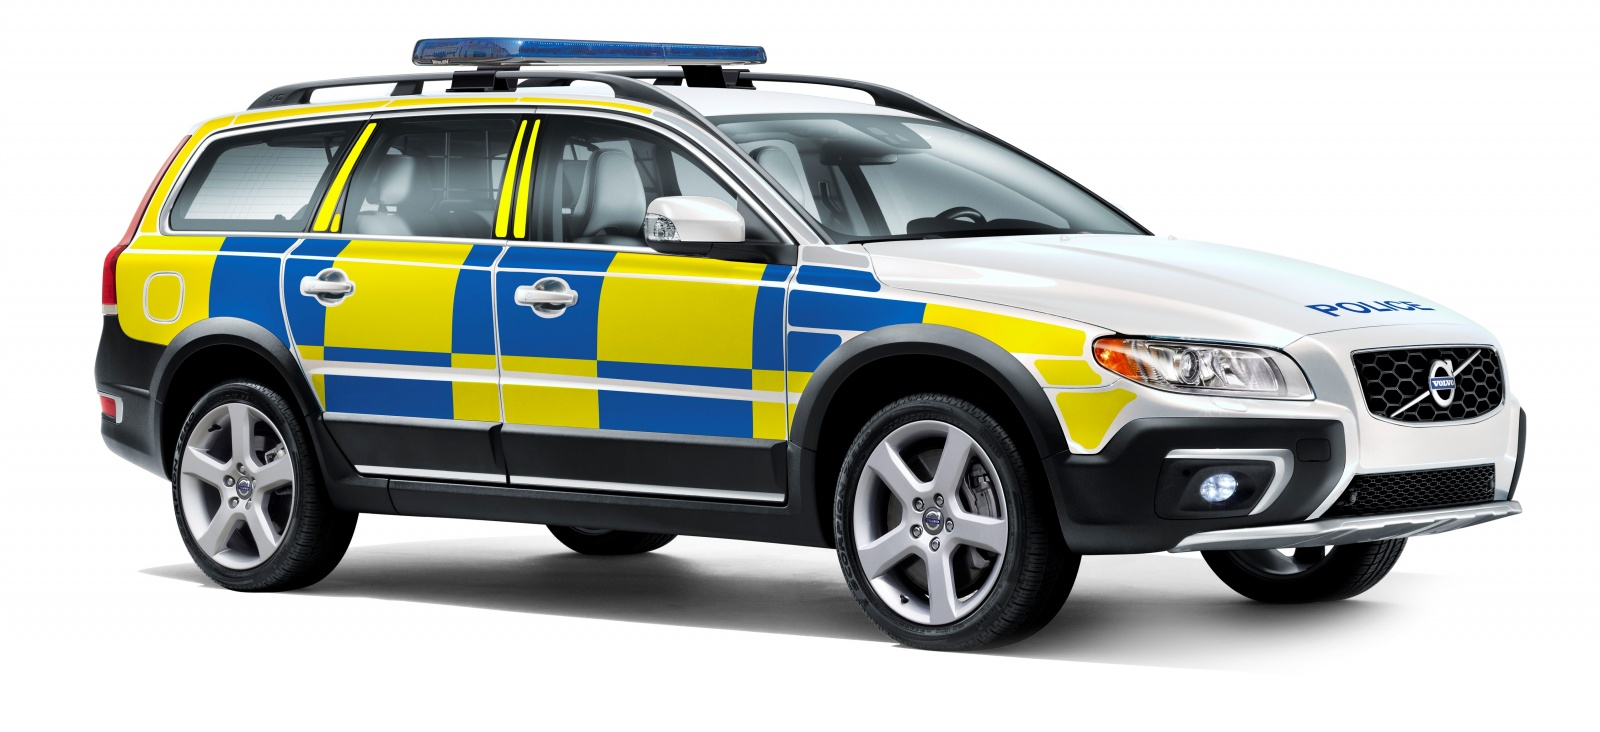 Police car visiting nursery - Wed 11th May - Cramond Primary School ...